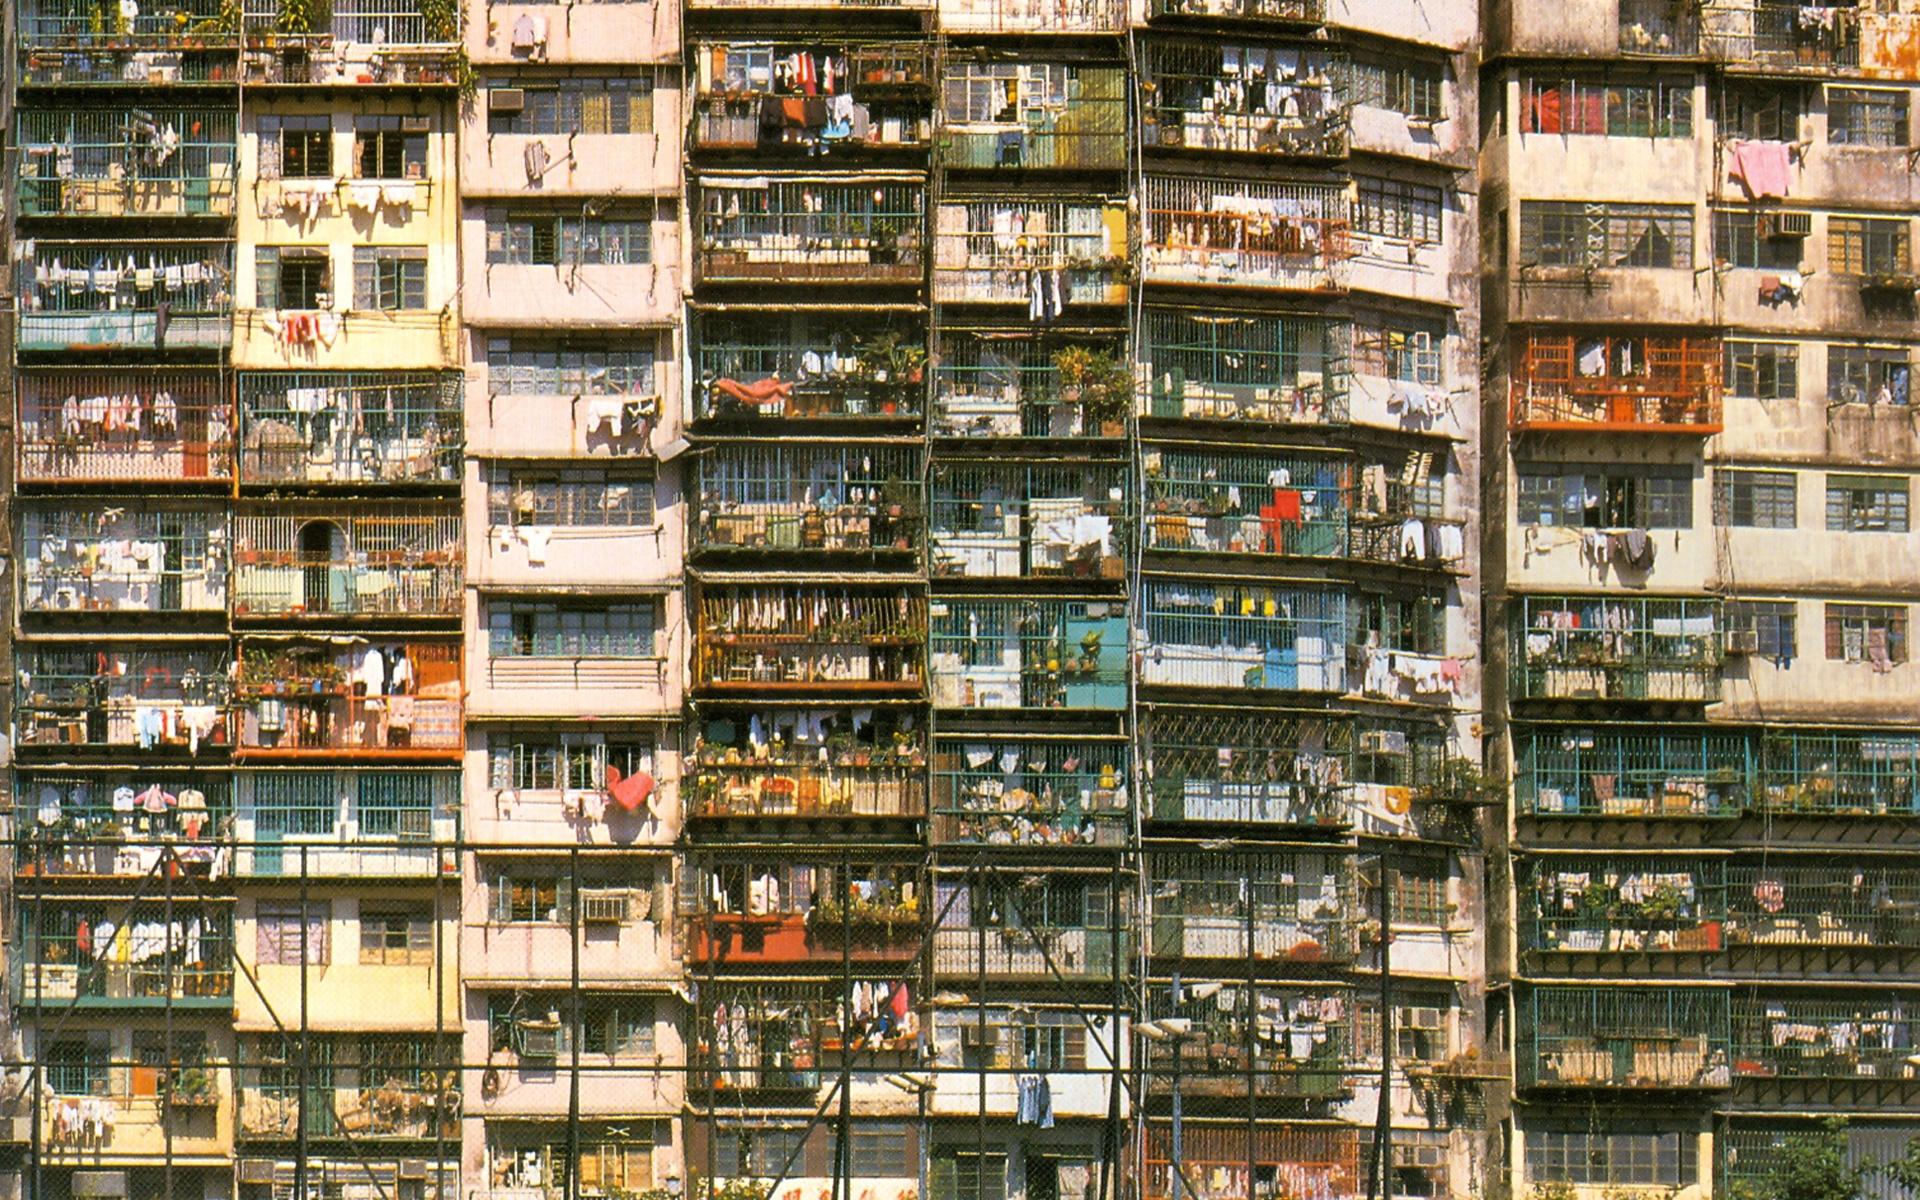 kowloon_walled_city_desktop_1920x1200_wallpaper-438143.jpg